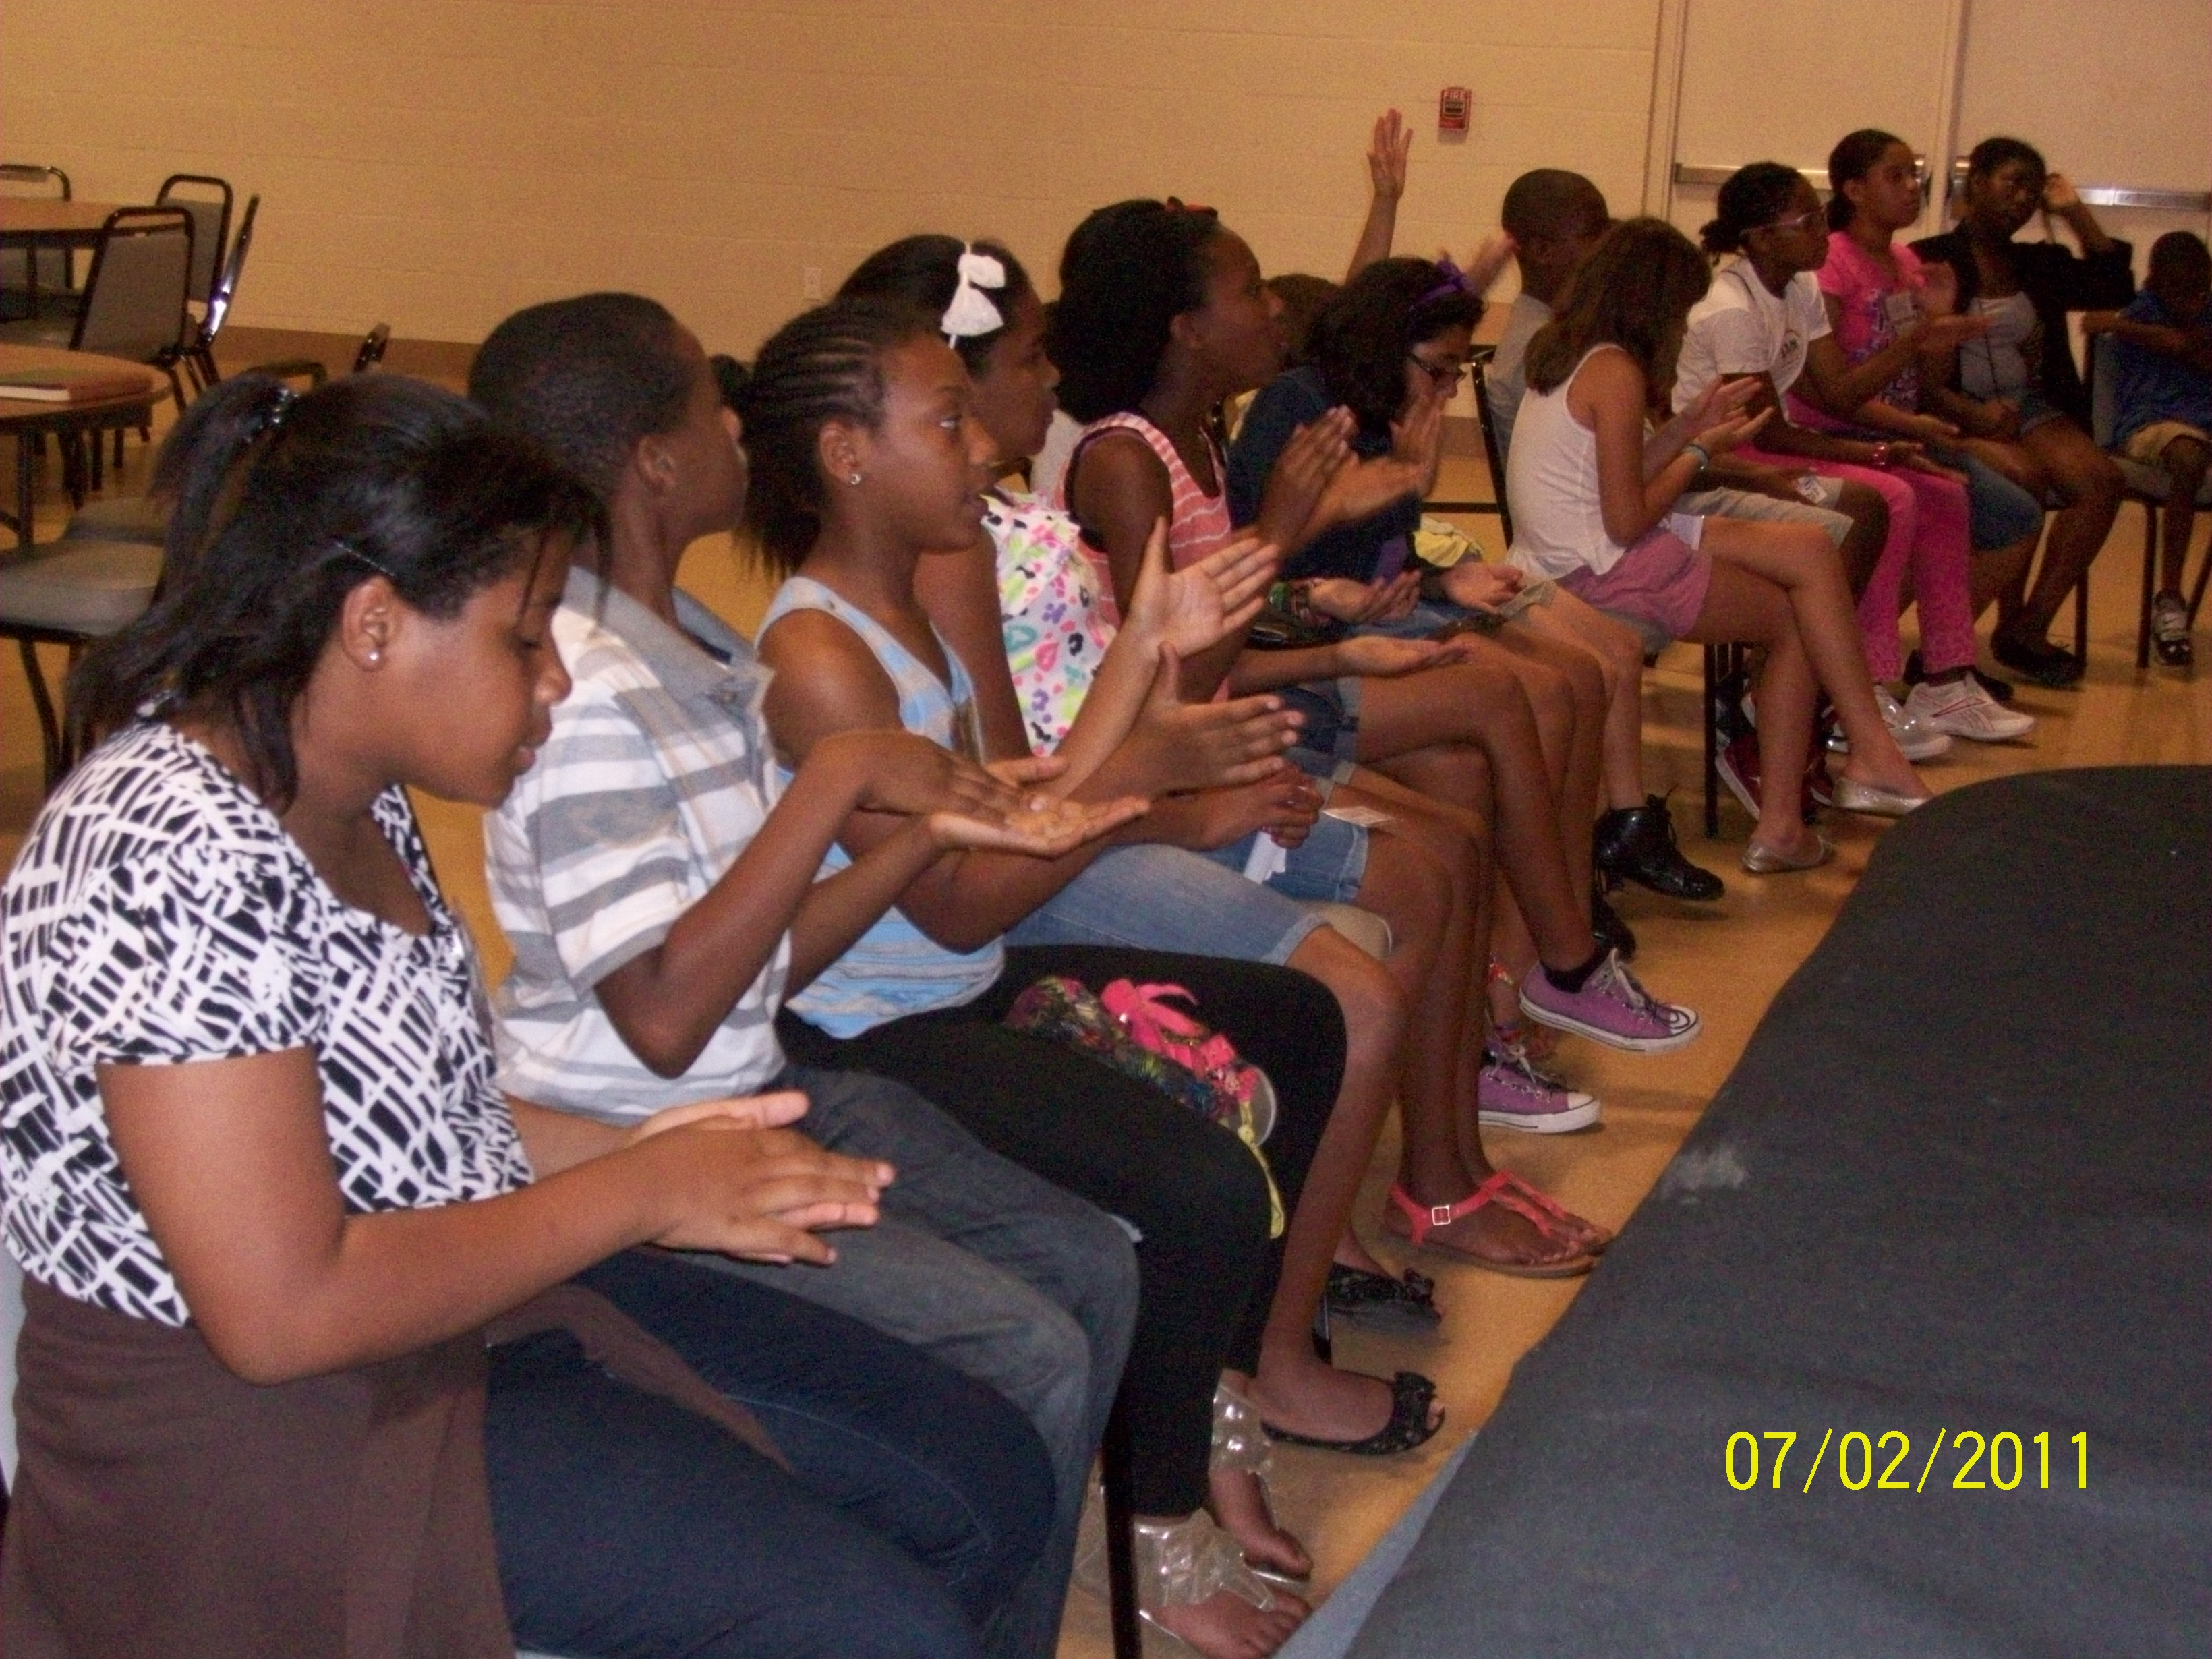 summer school and ms headley 947